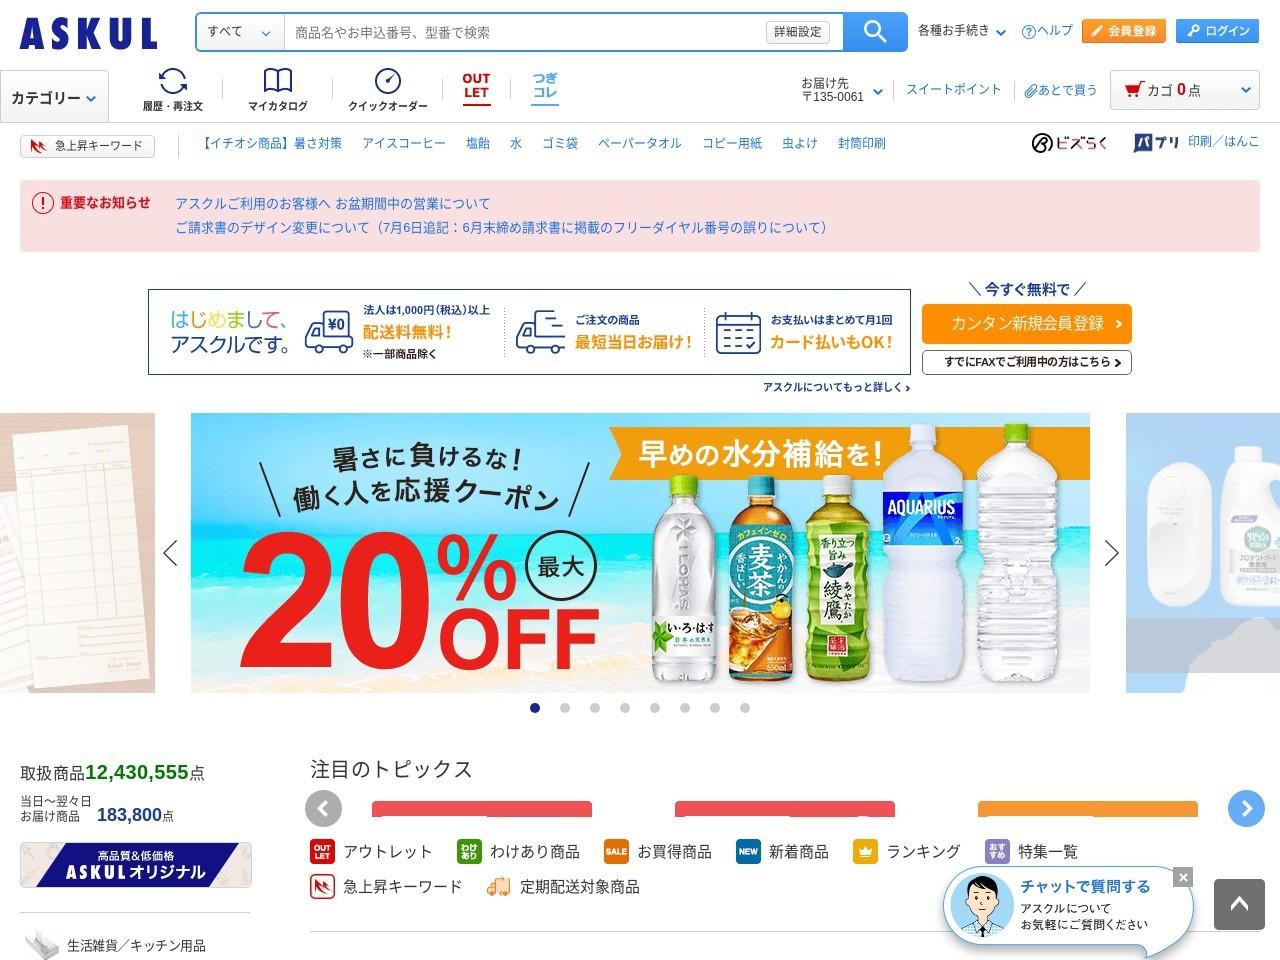 【ASKUL】オフィス用品/現場用品/医療・介護用品の通販 アスクル